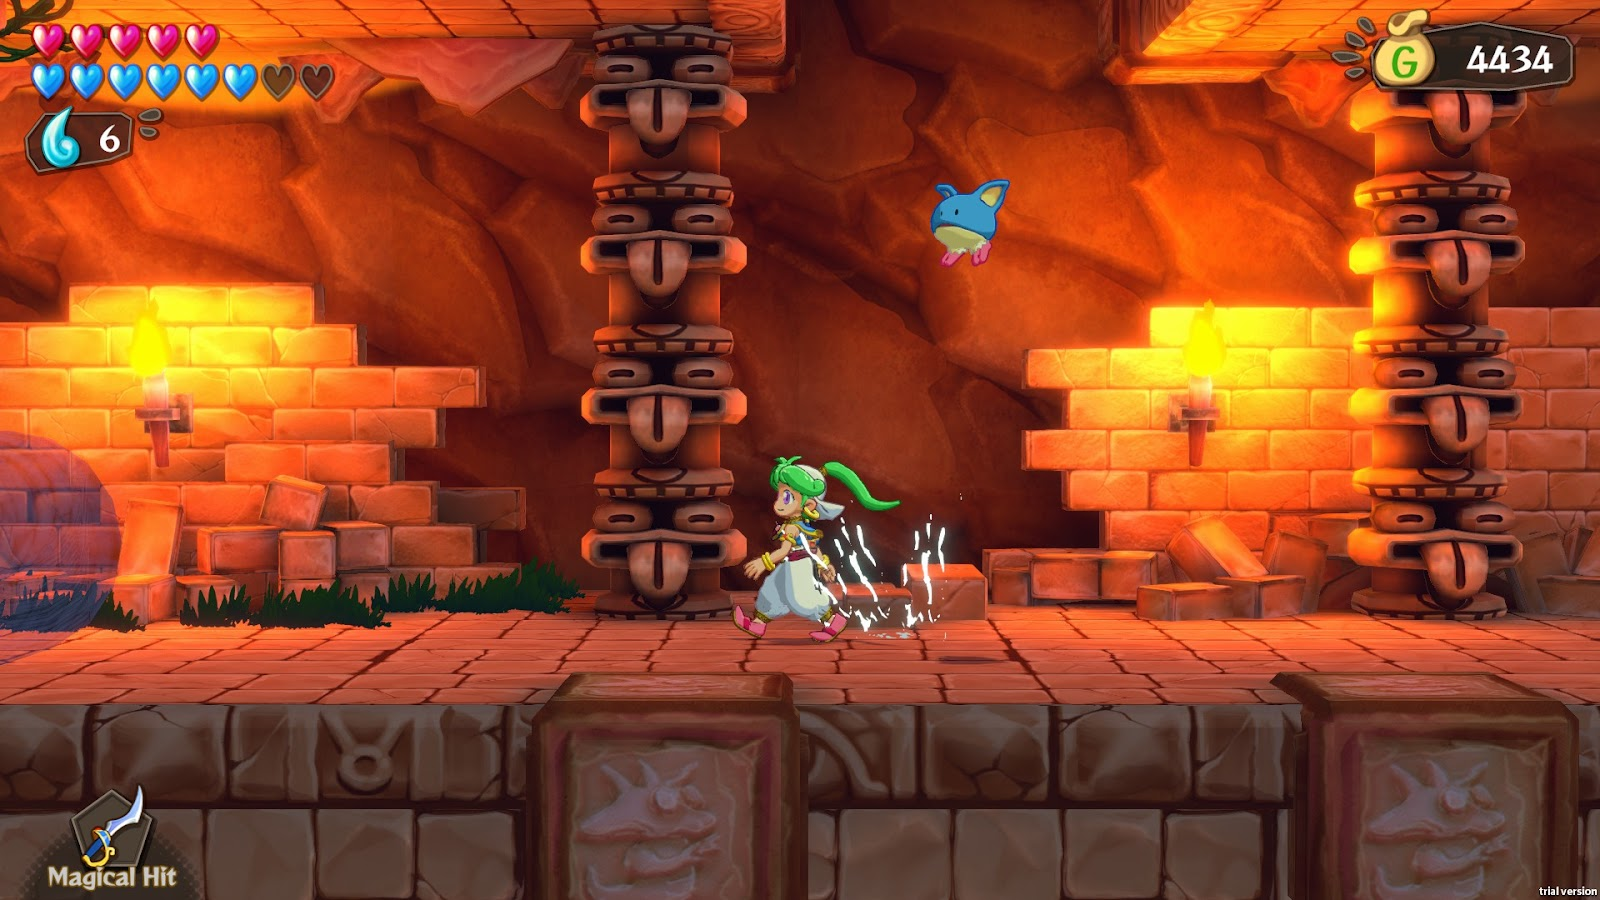 Screenshot 2 - Asha running in fiery level